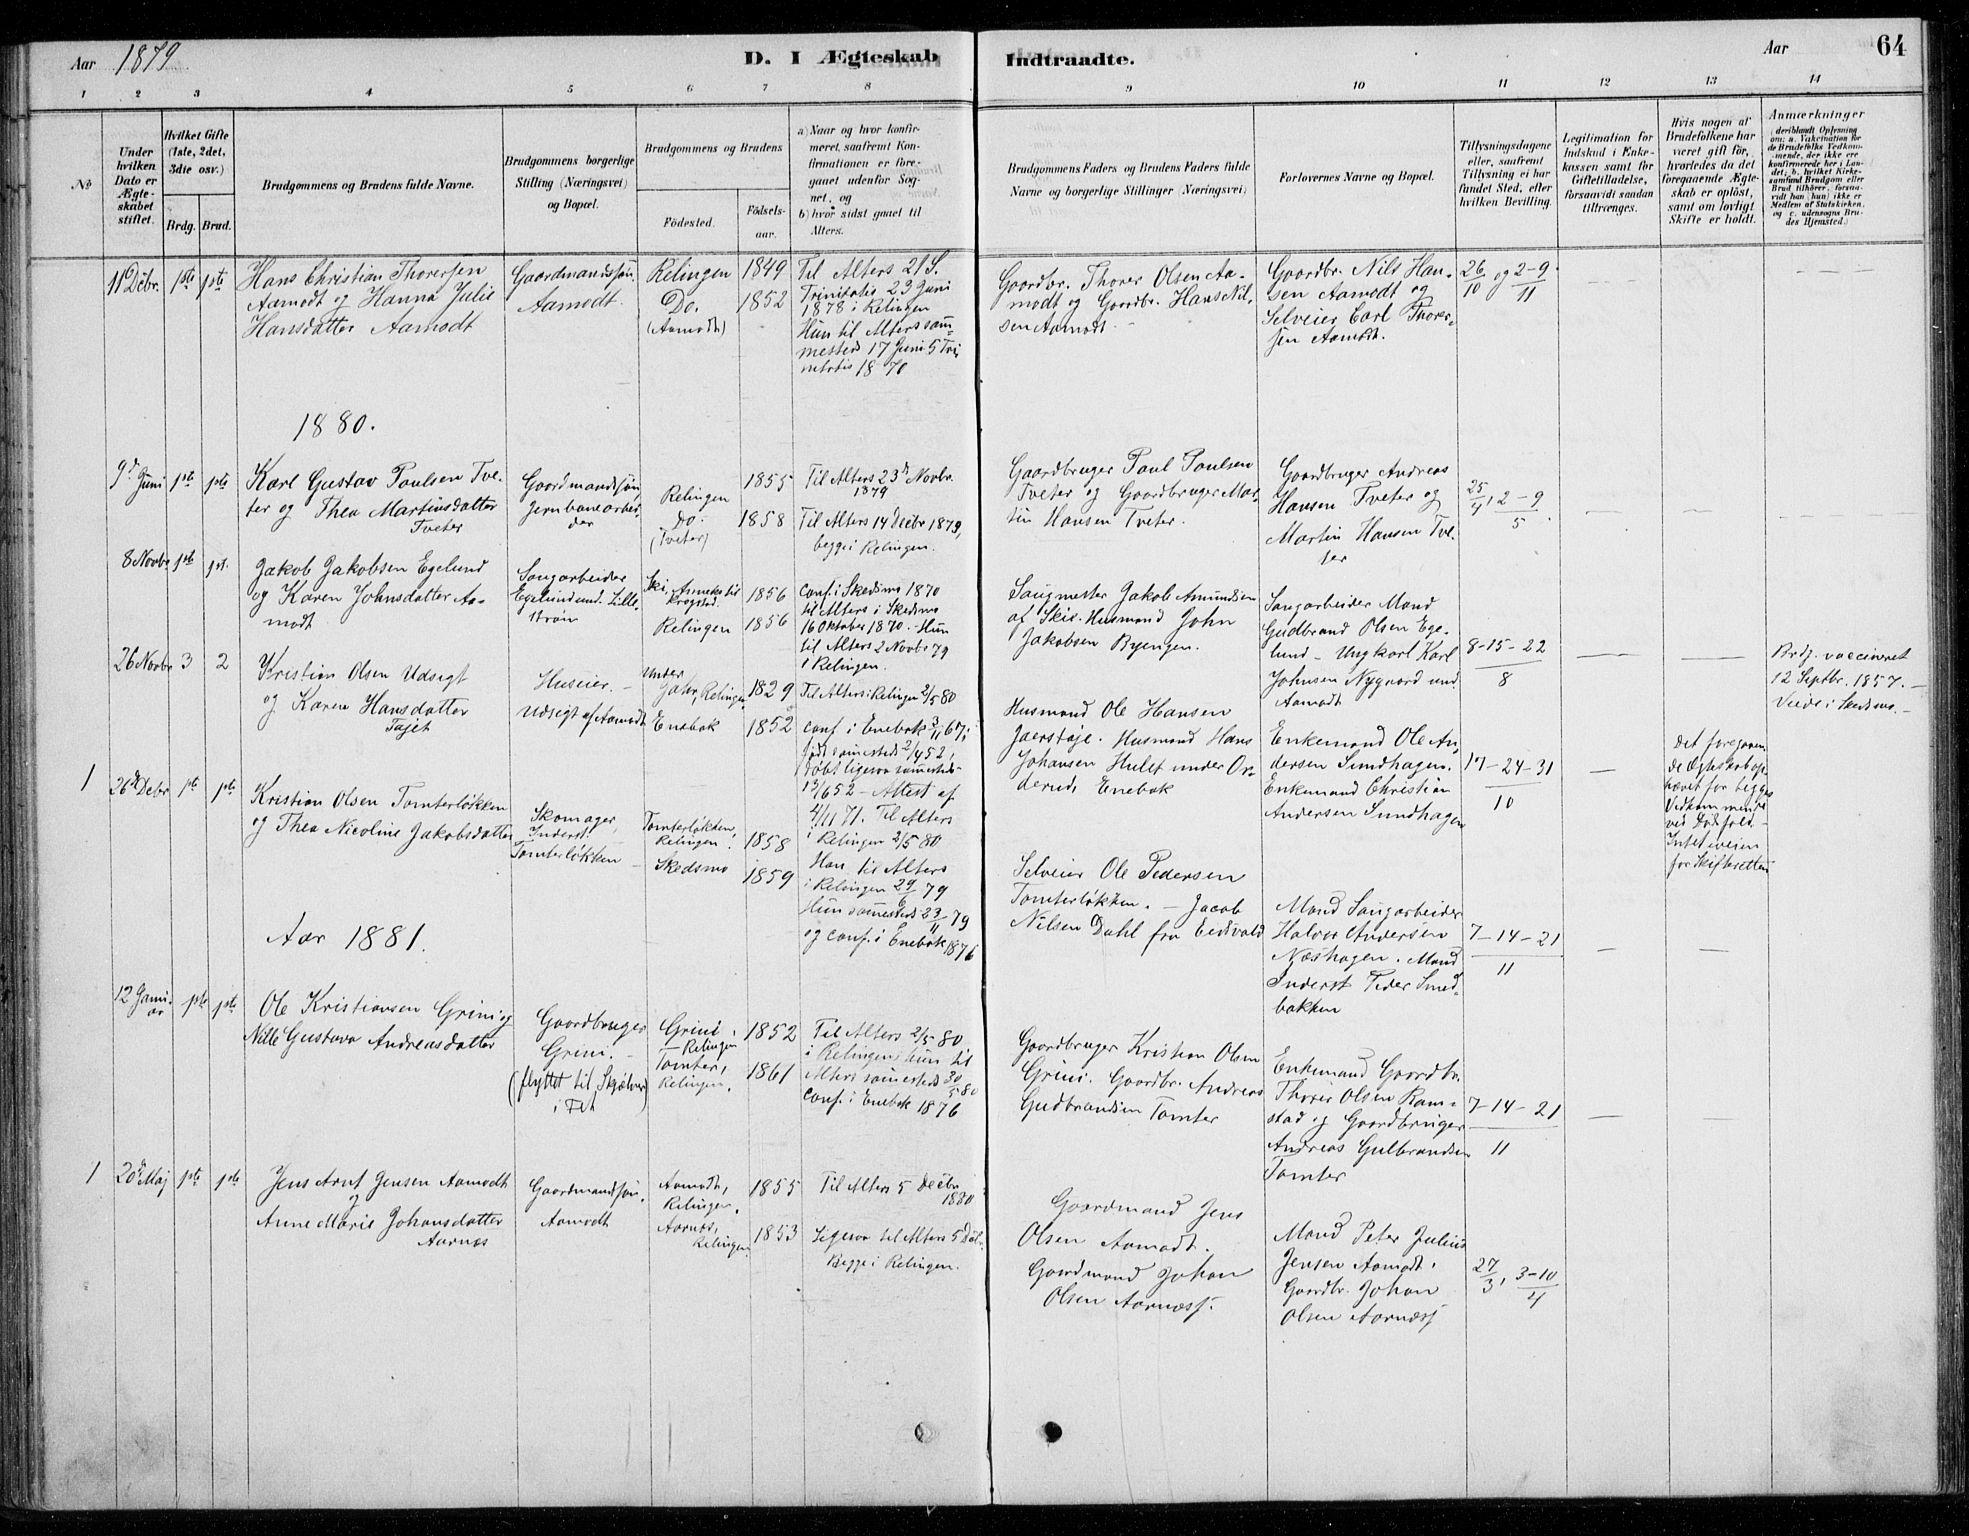 SAO, Fet prestekontor Kirkebøker, G/Gb/L0002: Klokkerbok nr. II 2, 1878-1911, s. 64